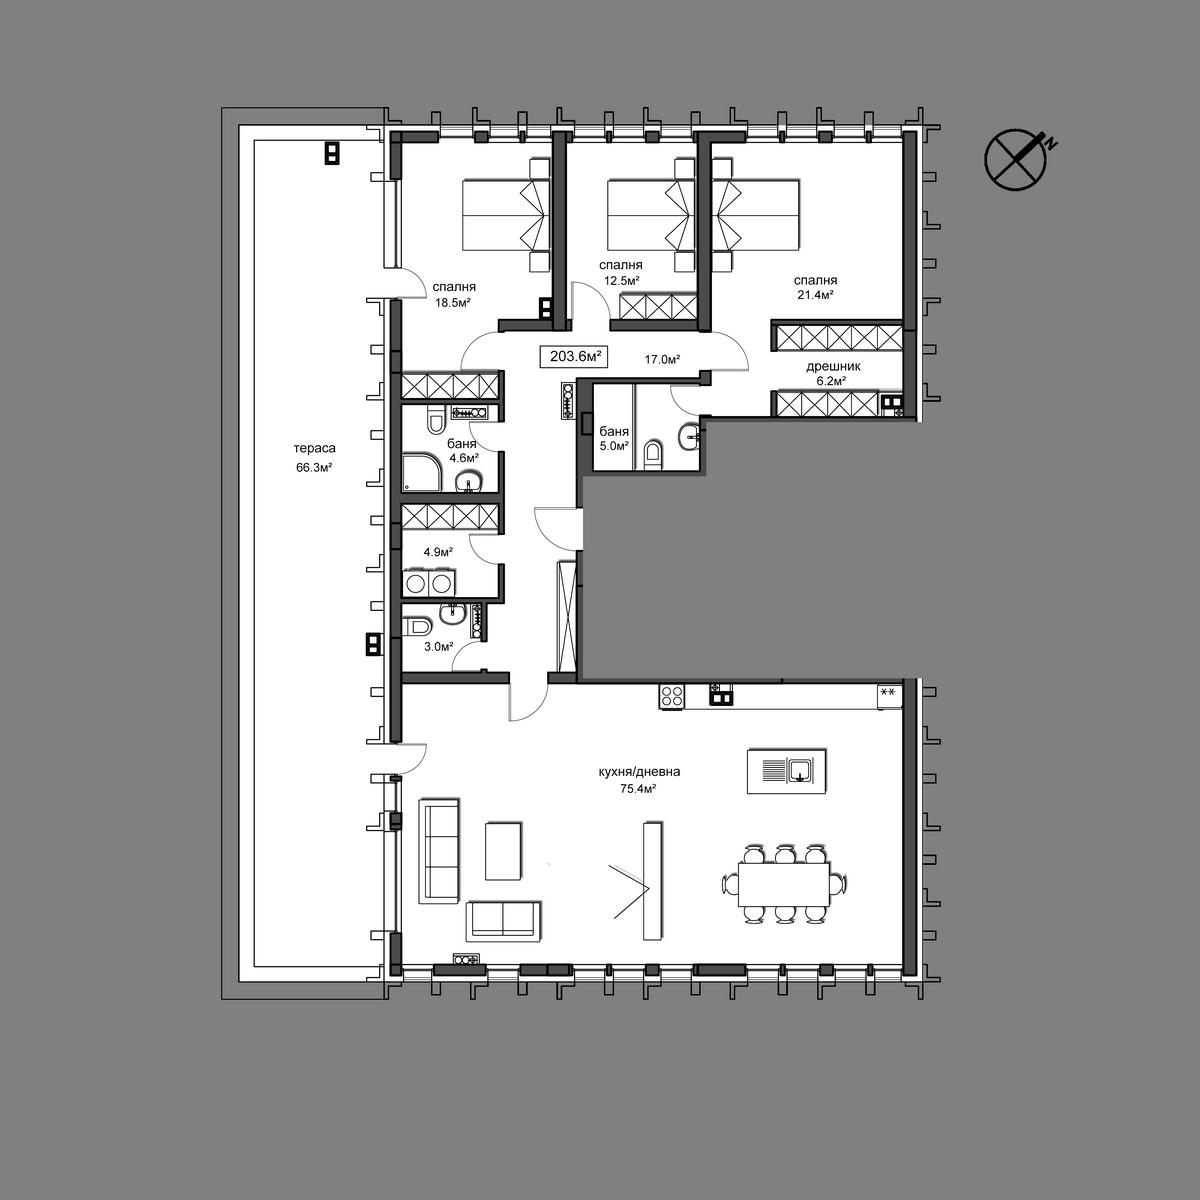 Продава апартамент - Апартамент 48